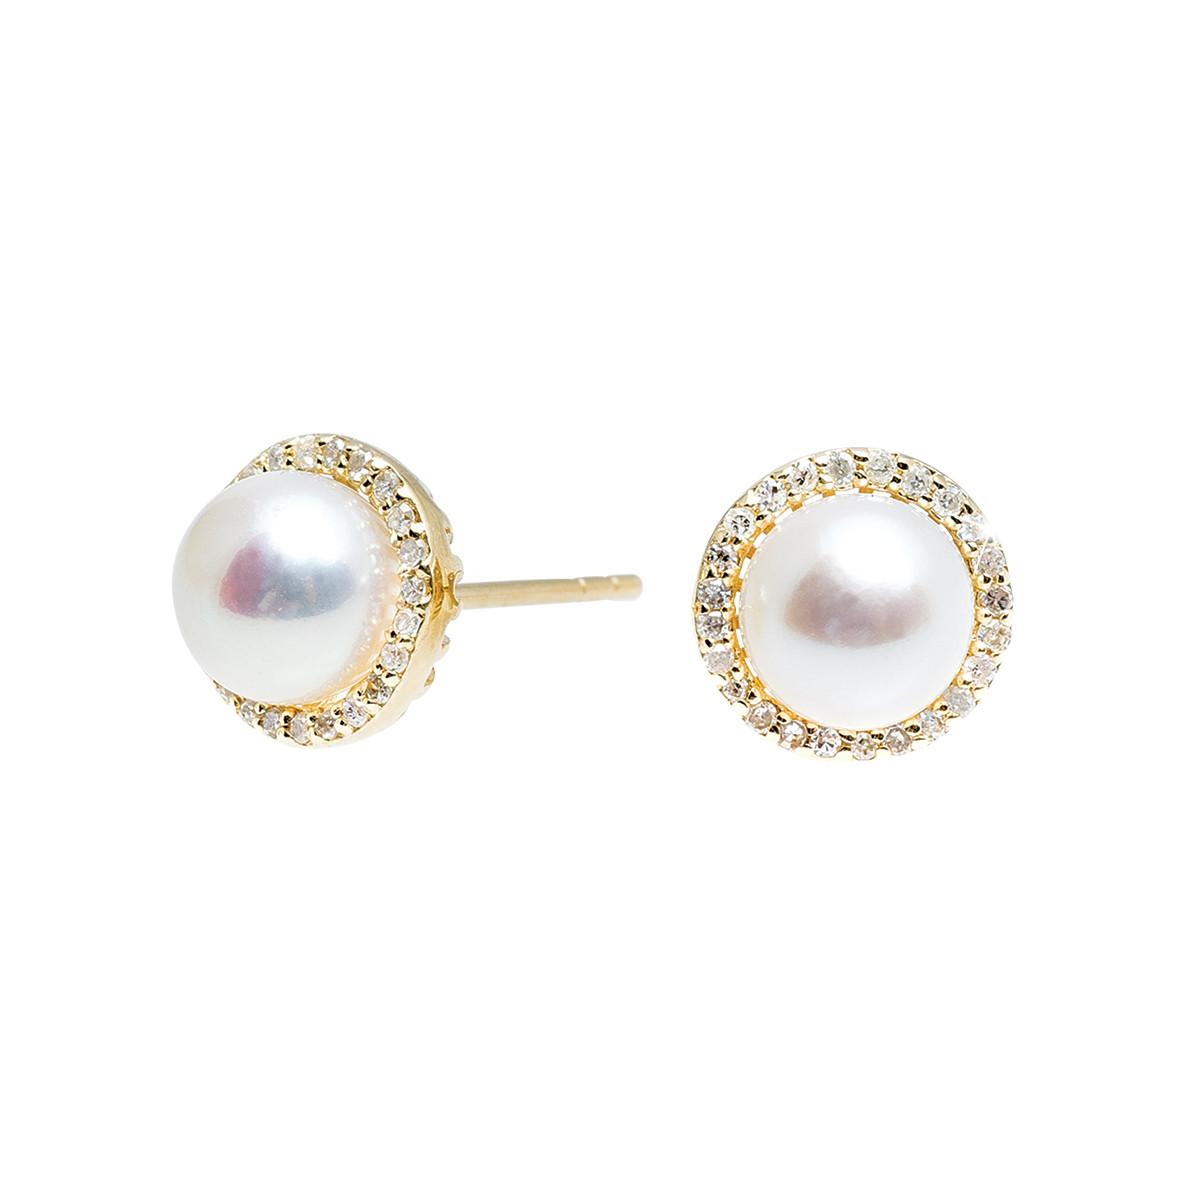 New Madison L 0.16 CTW Diamond & Pearl Earrings